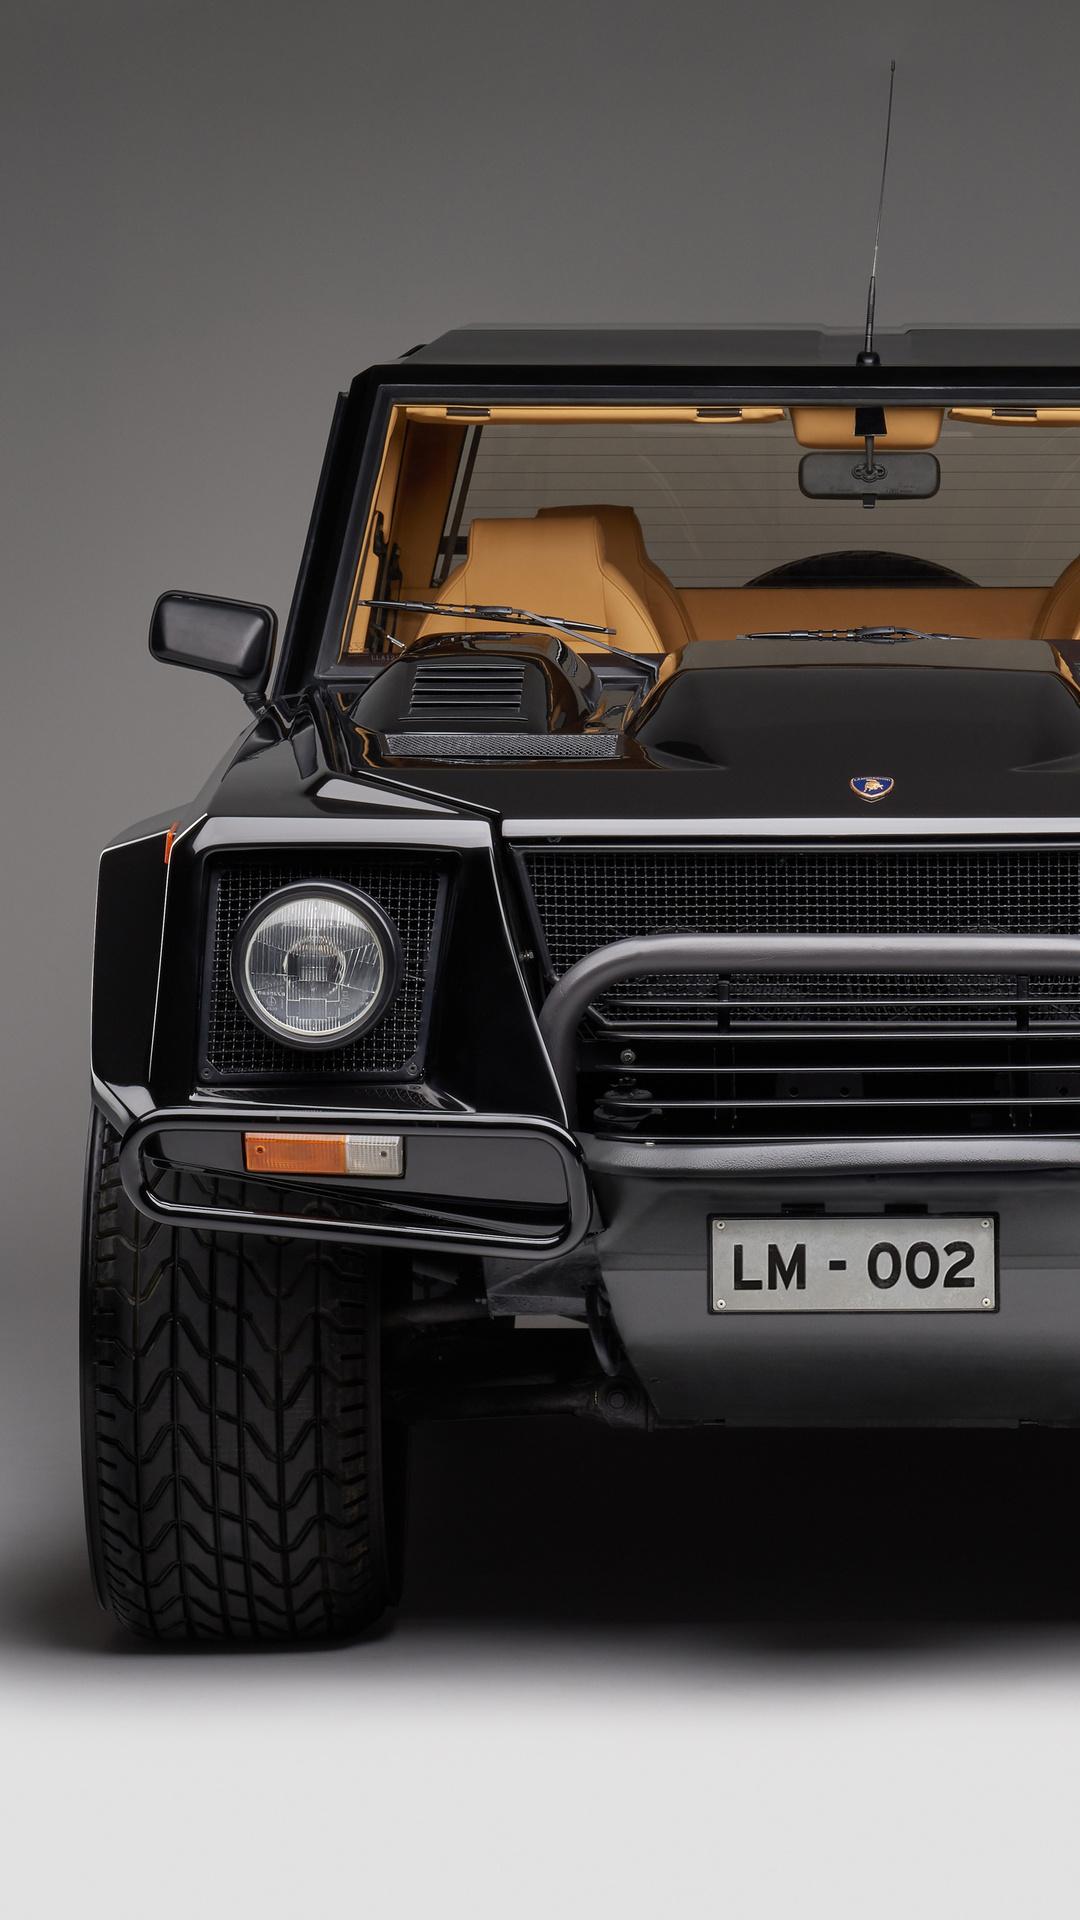 34 Best Lamborghini Lm002 Ideas Lamborghini Lambo Offroad Vehicles